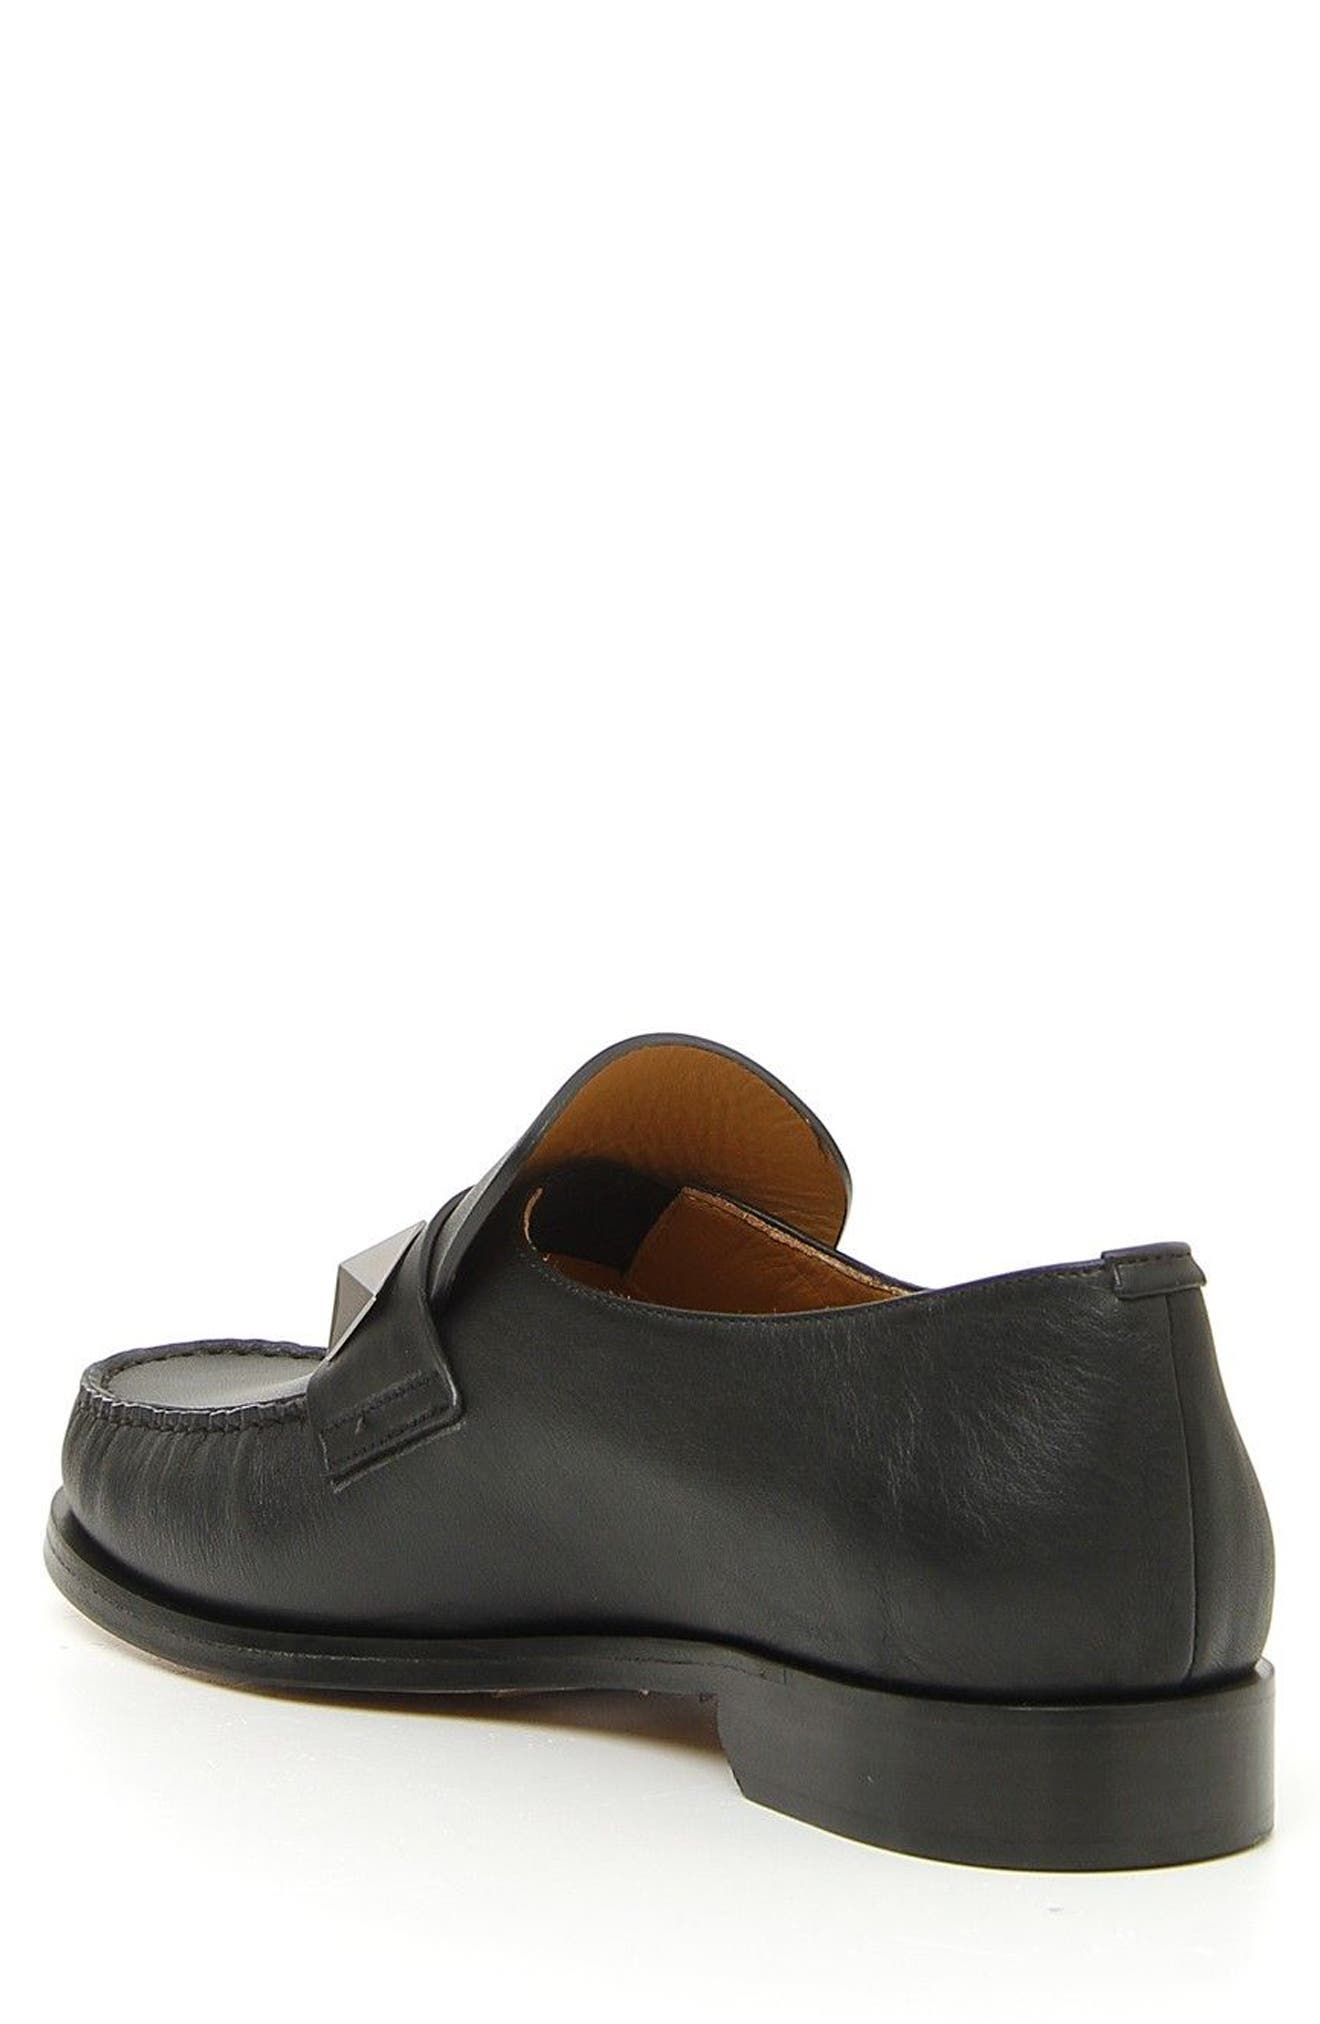 Lock Loafer,                             Alternate thumbnail 2, color,                             Black